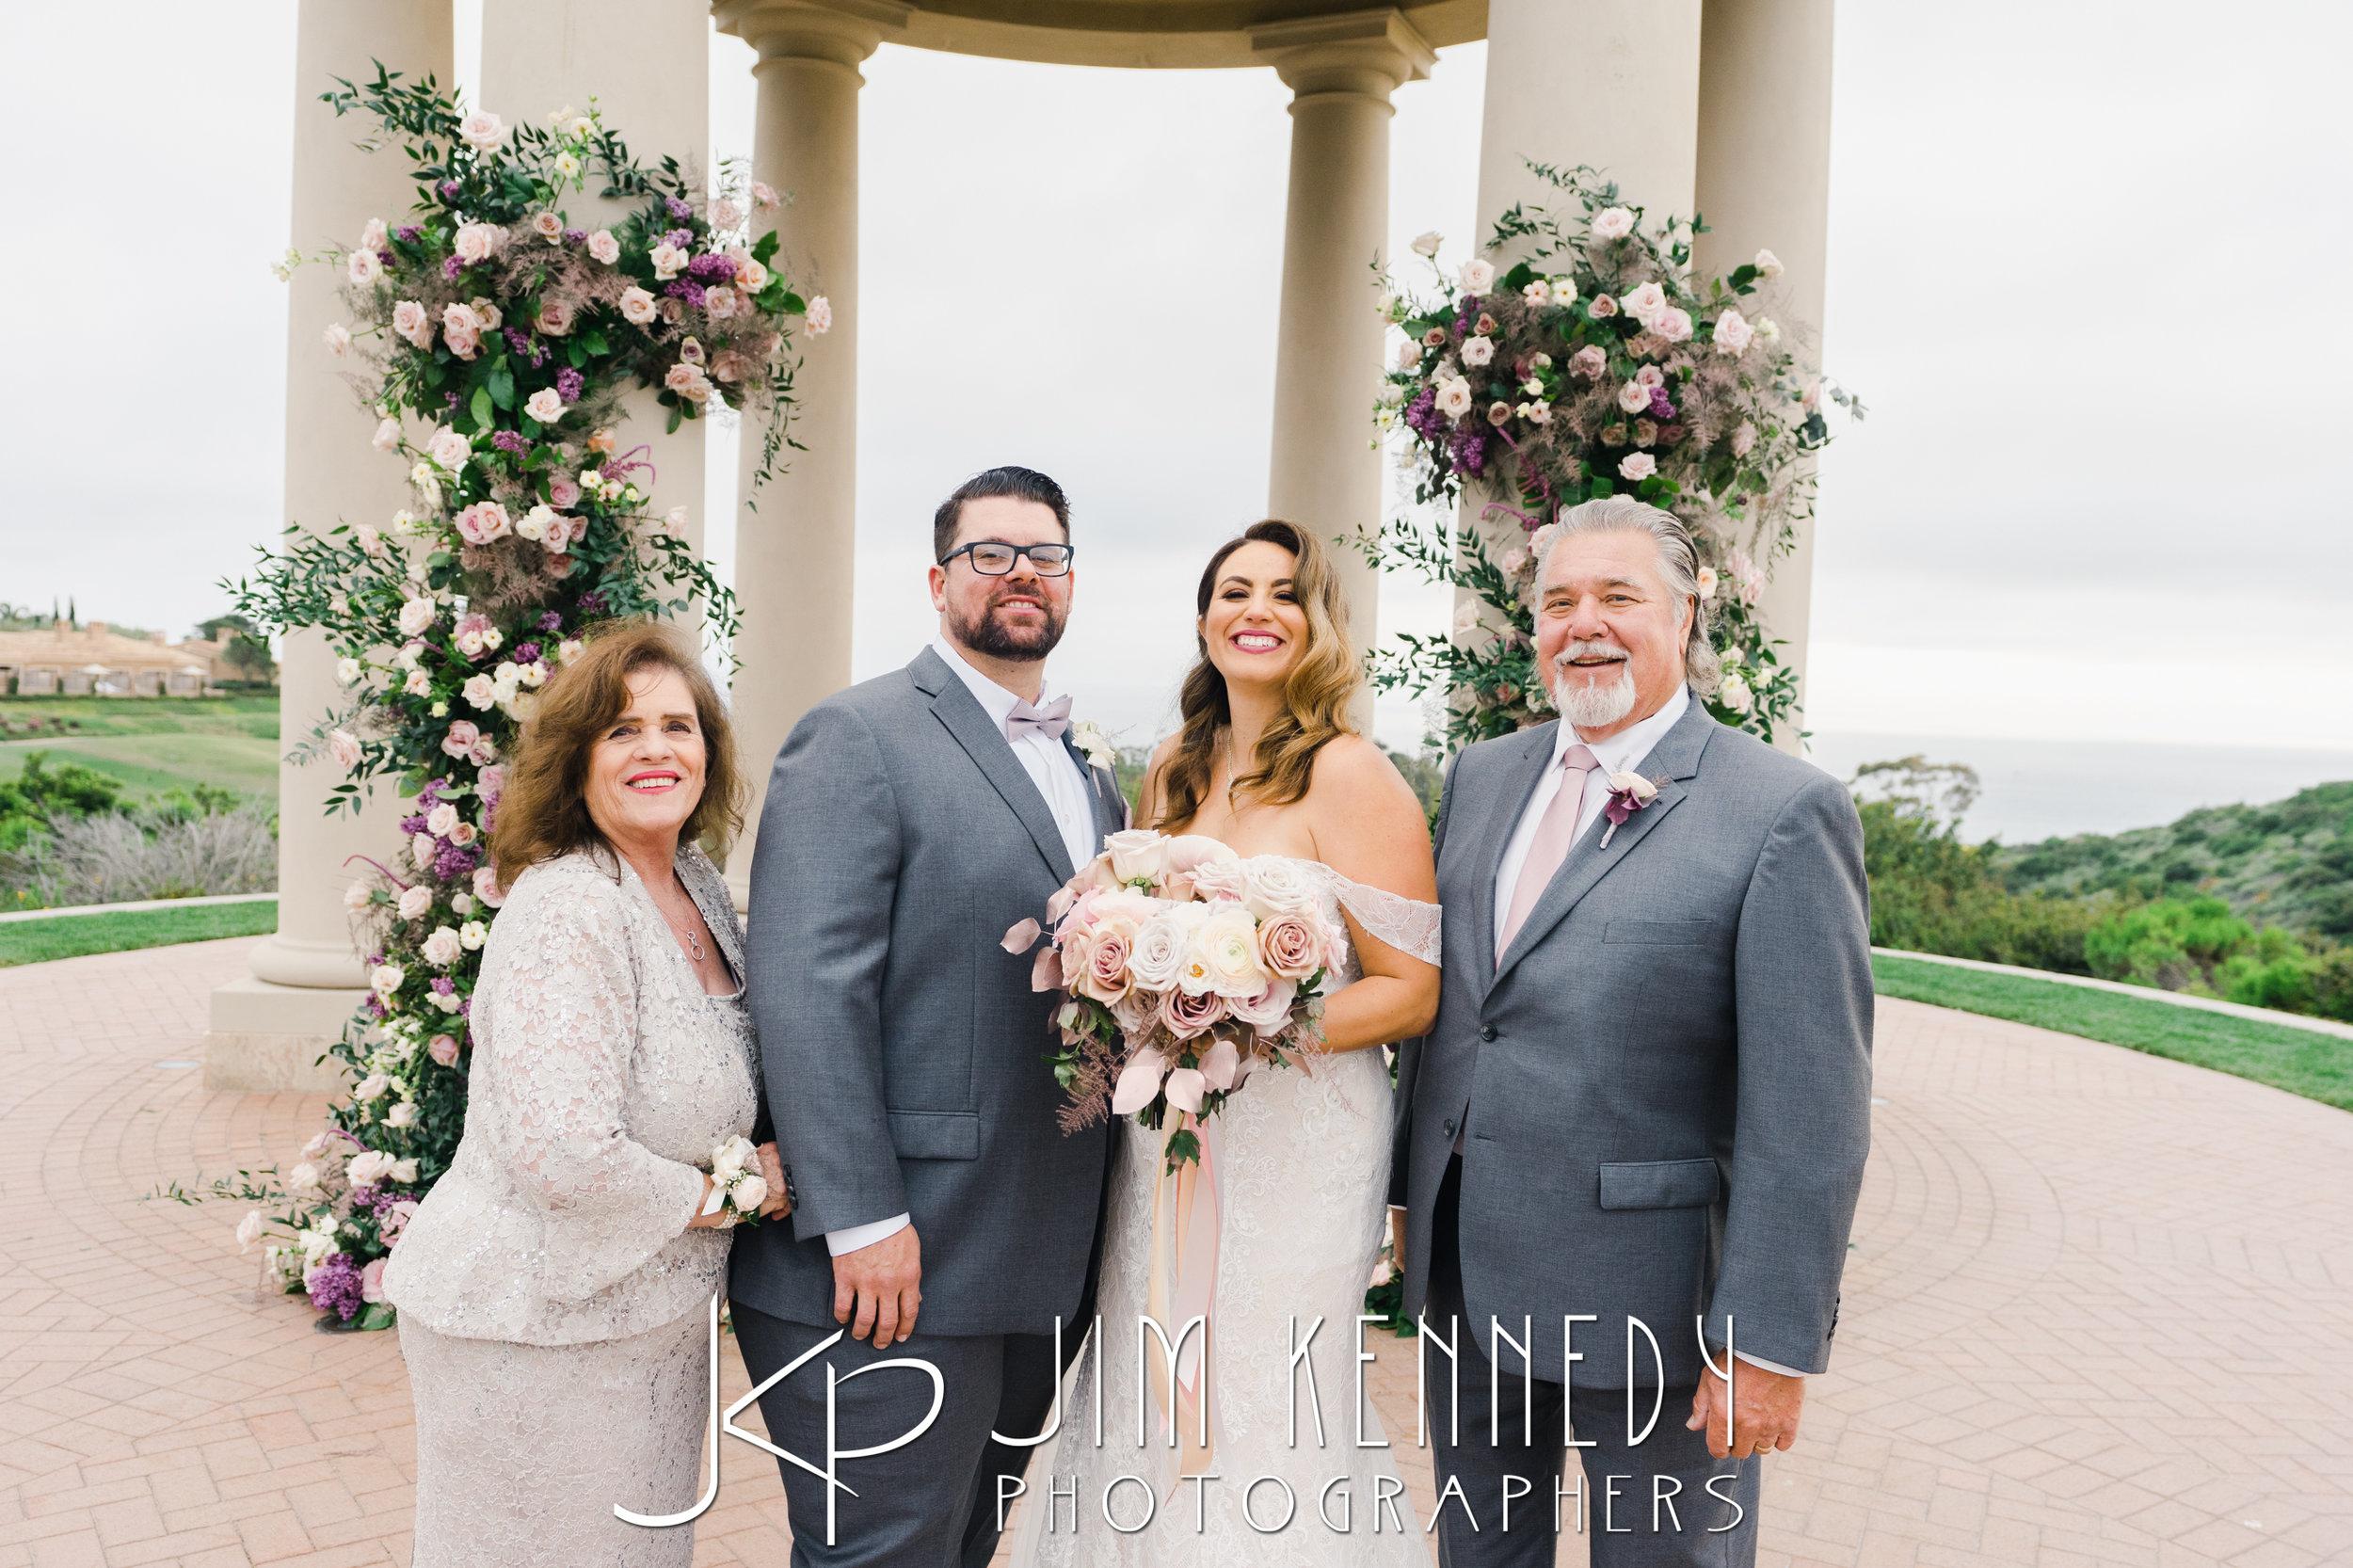 pelican-hill-wedding-jim-kenedy-photographers_0147.JPG